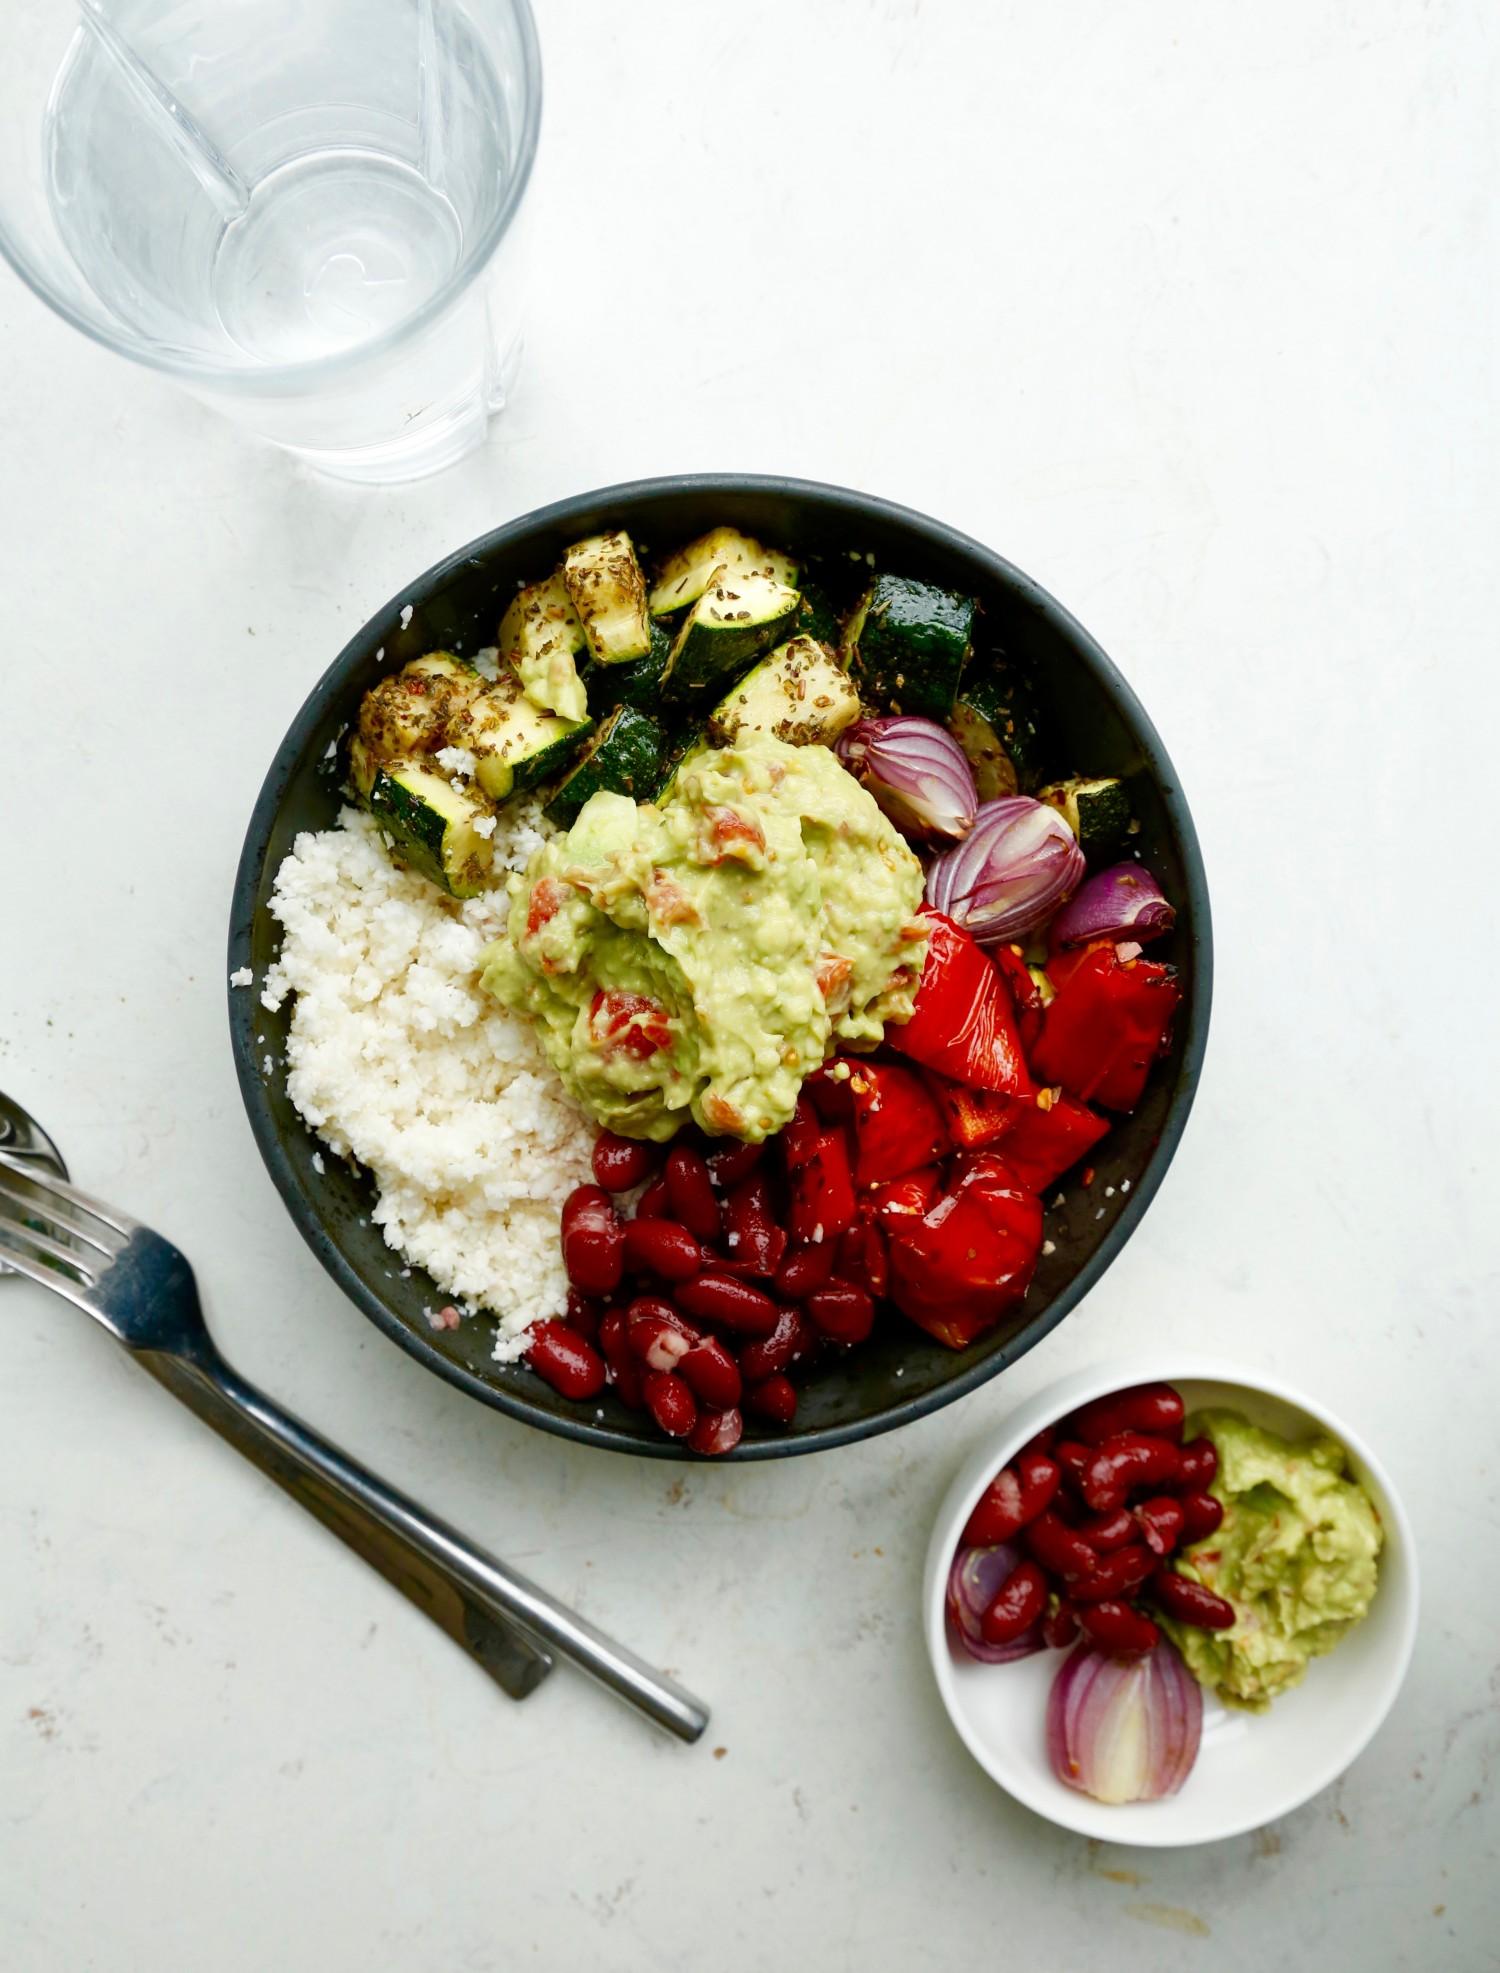 opskrift-burrito-bowl-salatskaal-med-mexicansk-tema-1